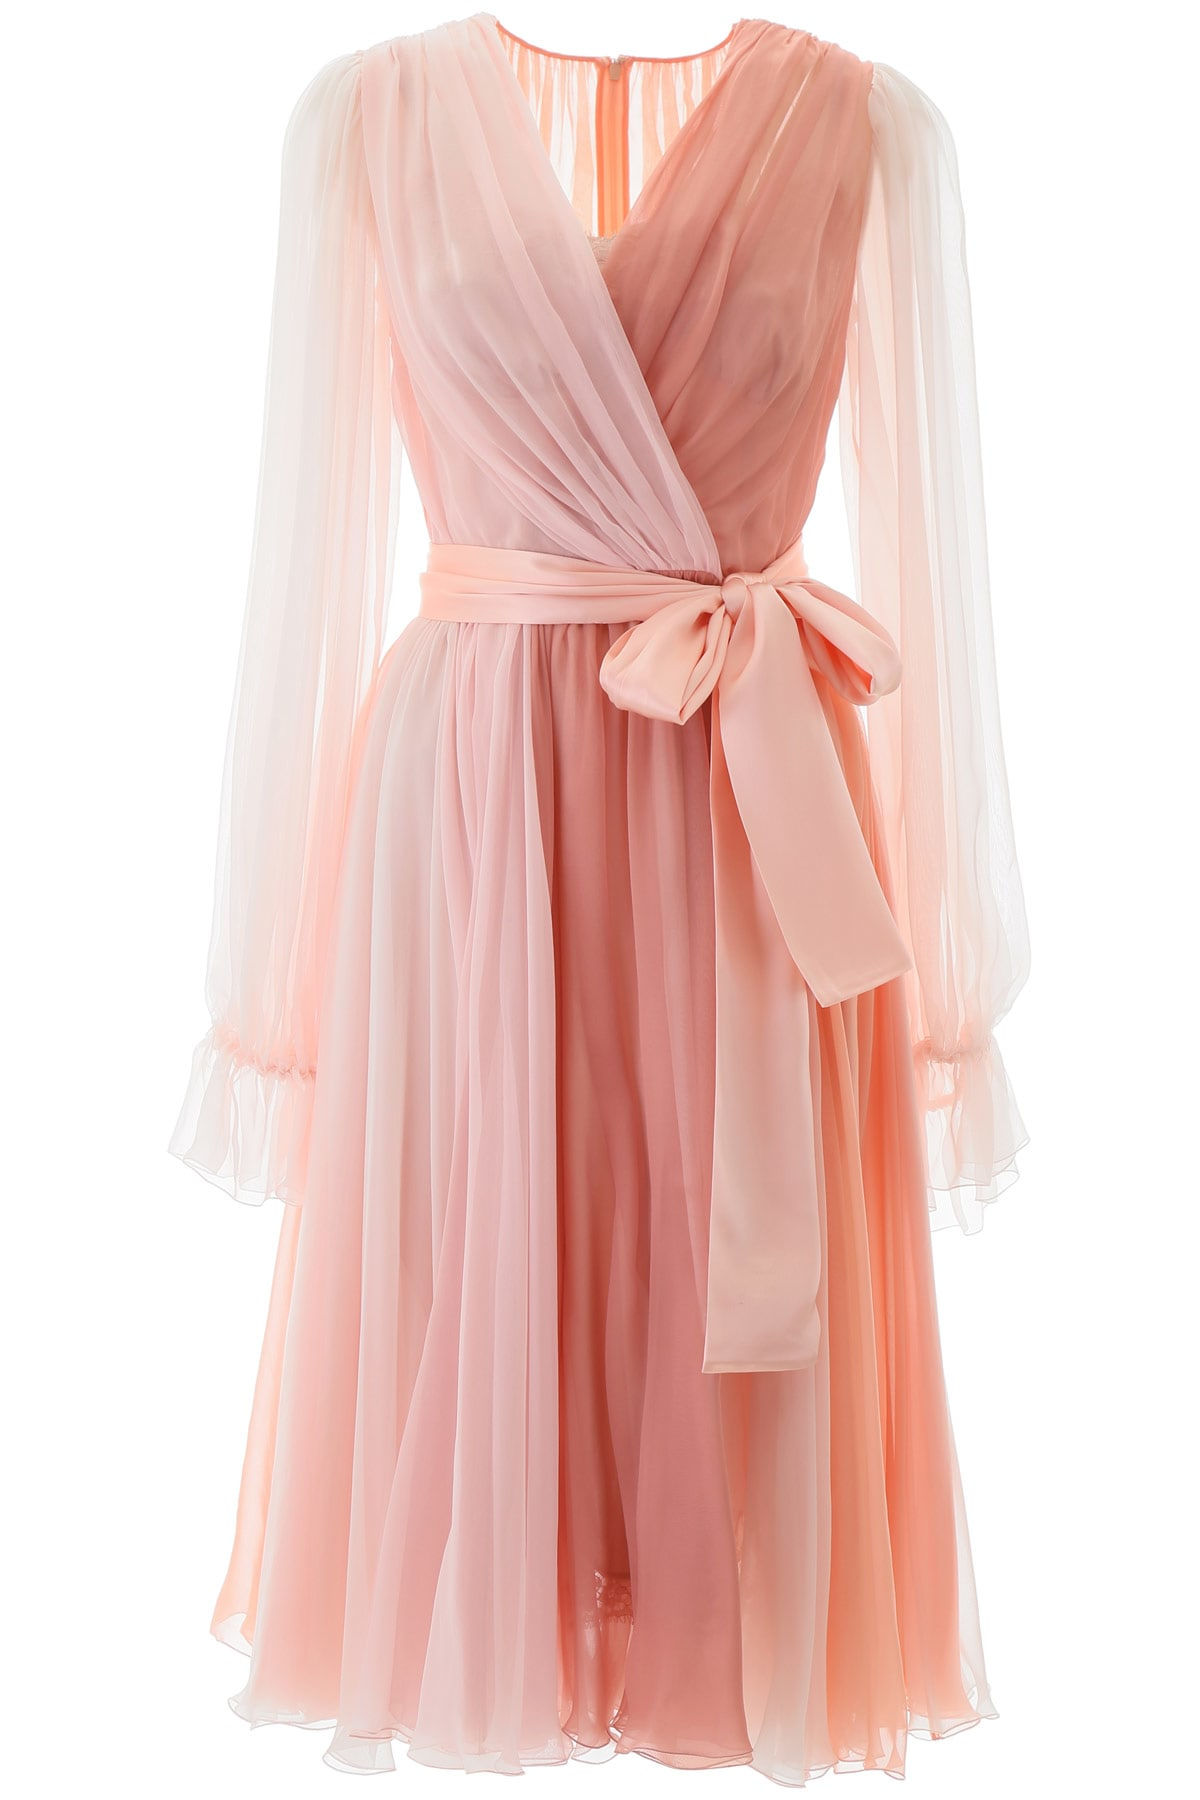 Buy Dolce & Gabbana Chiffon Shaded Dress online, shop Dolce & Gabbana with free shipping